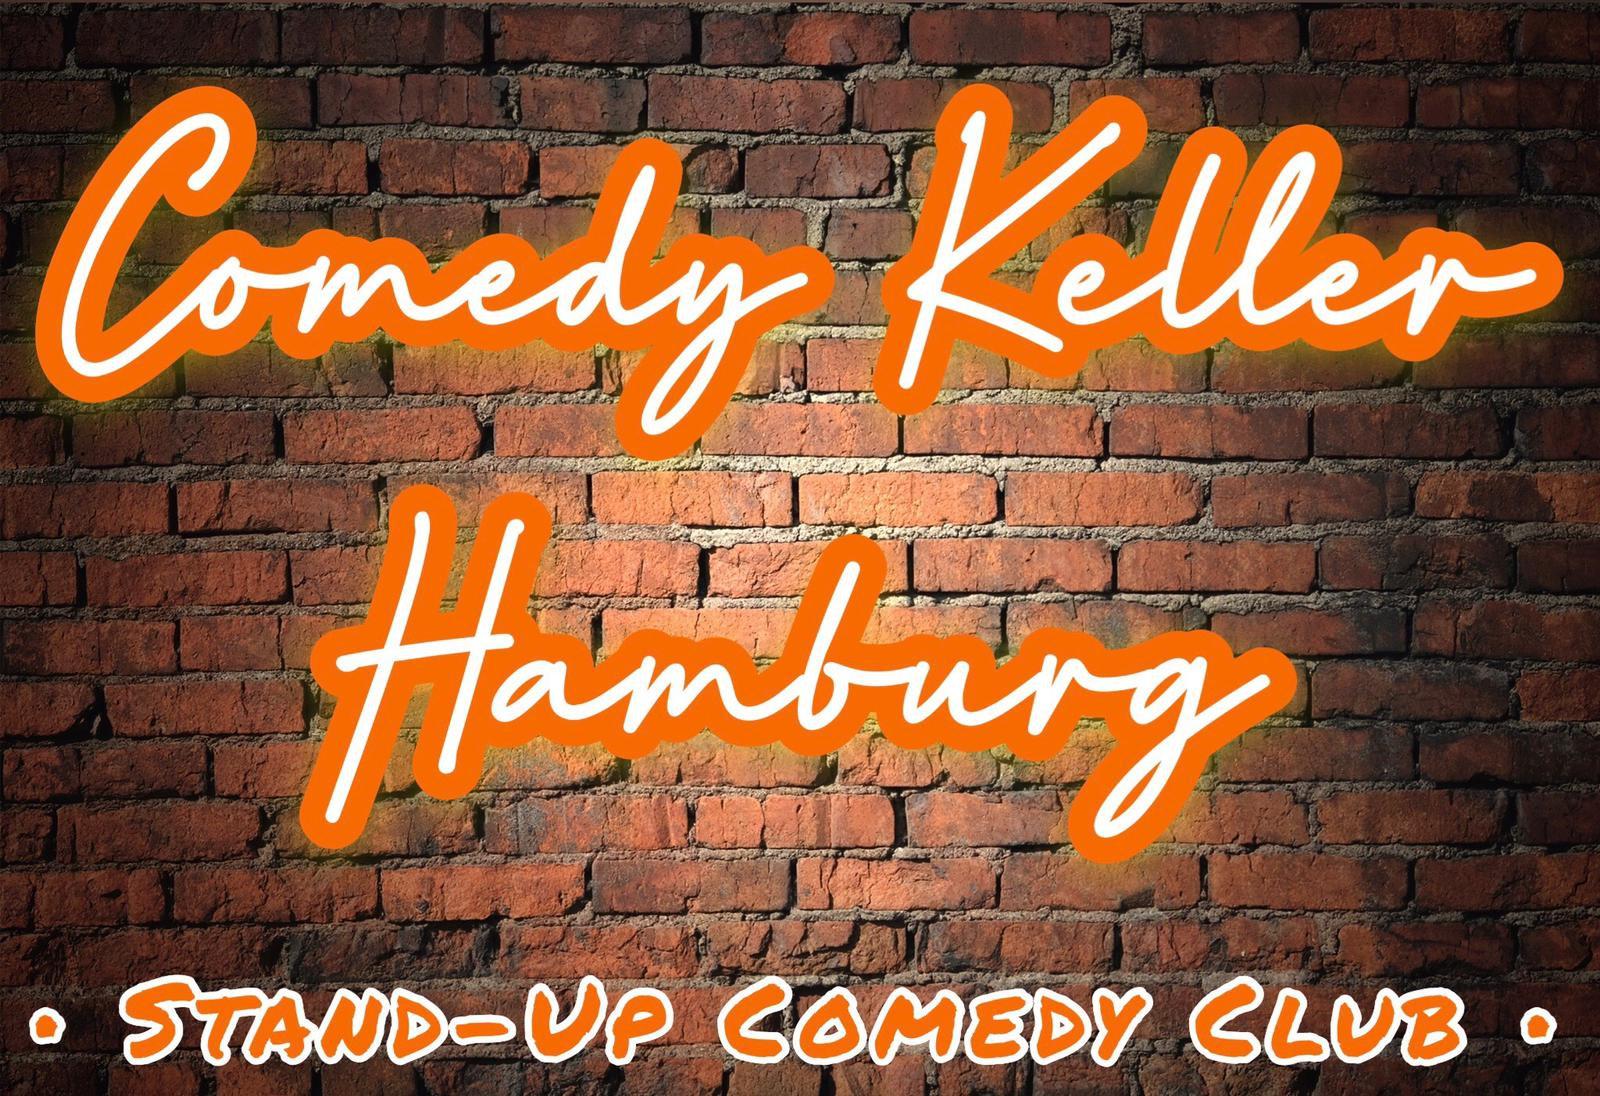 La Cova Comedy Keller